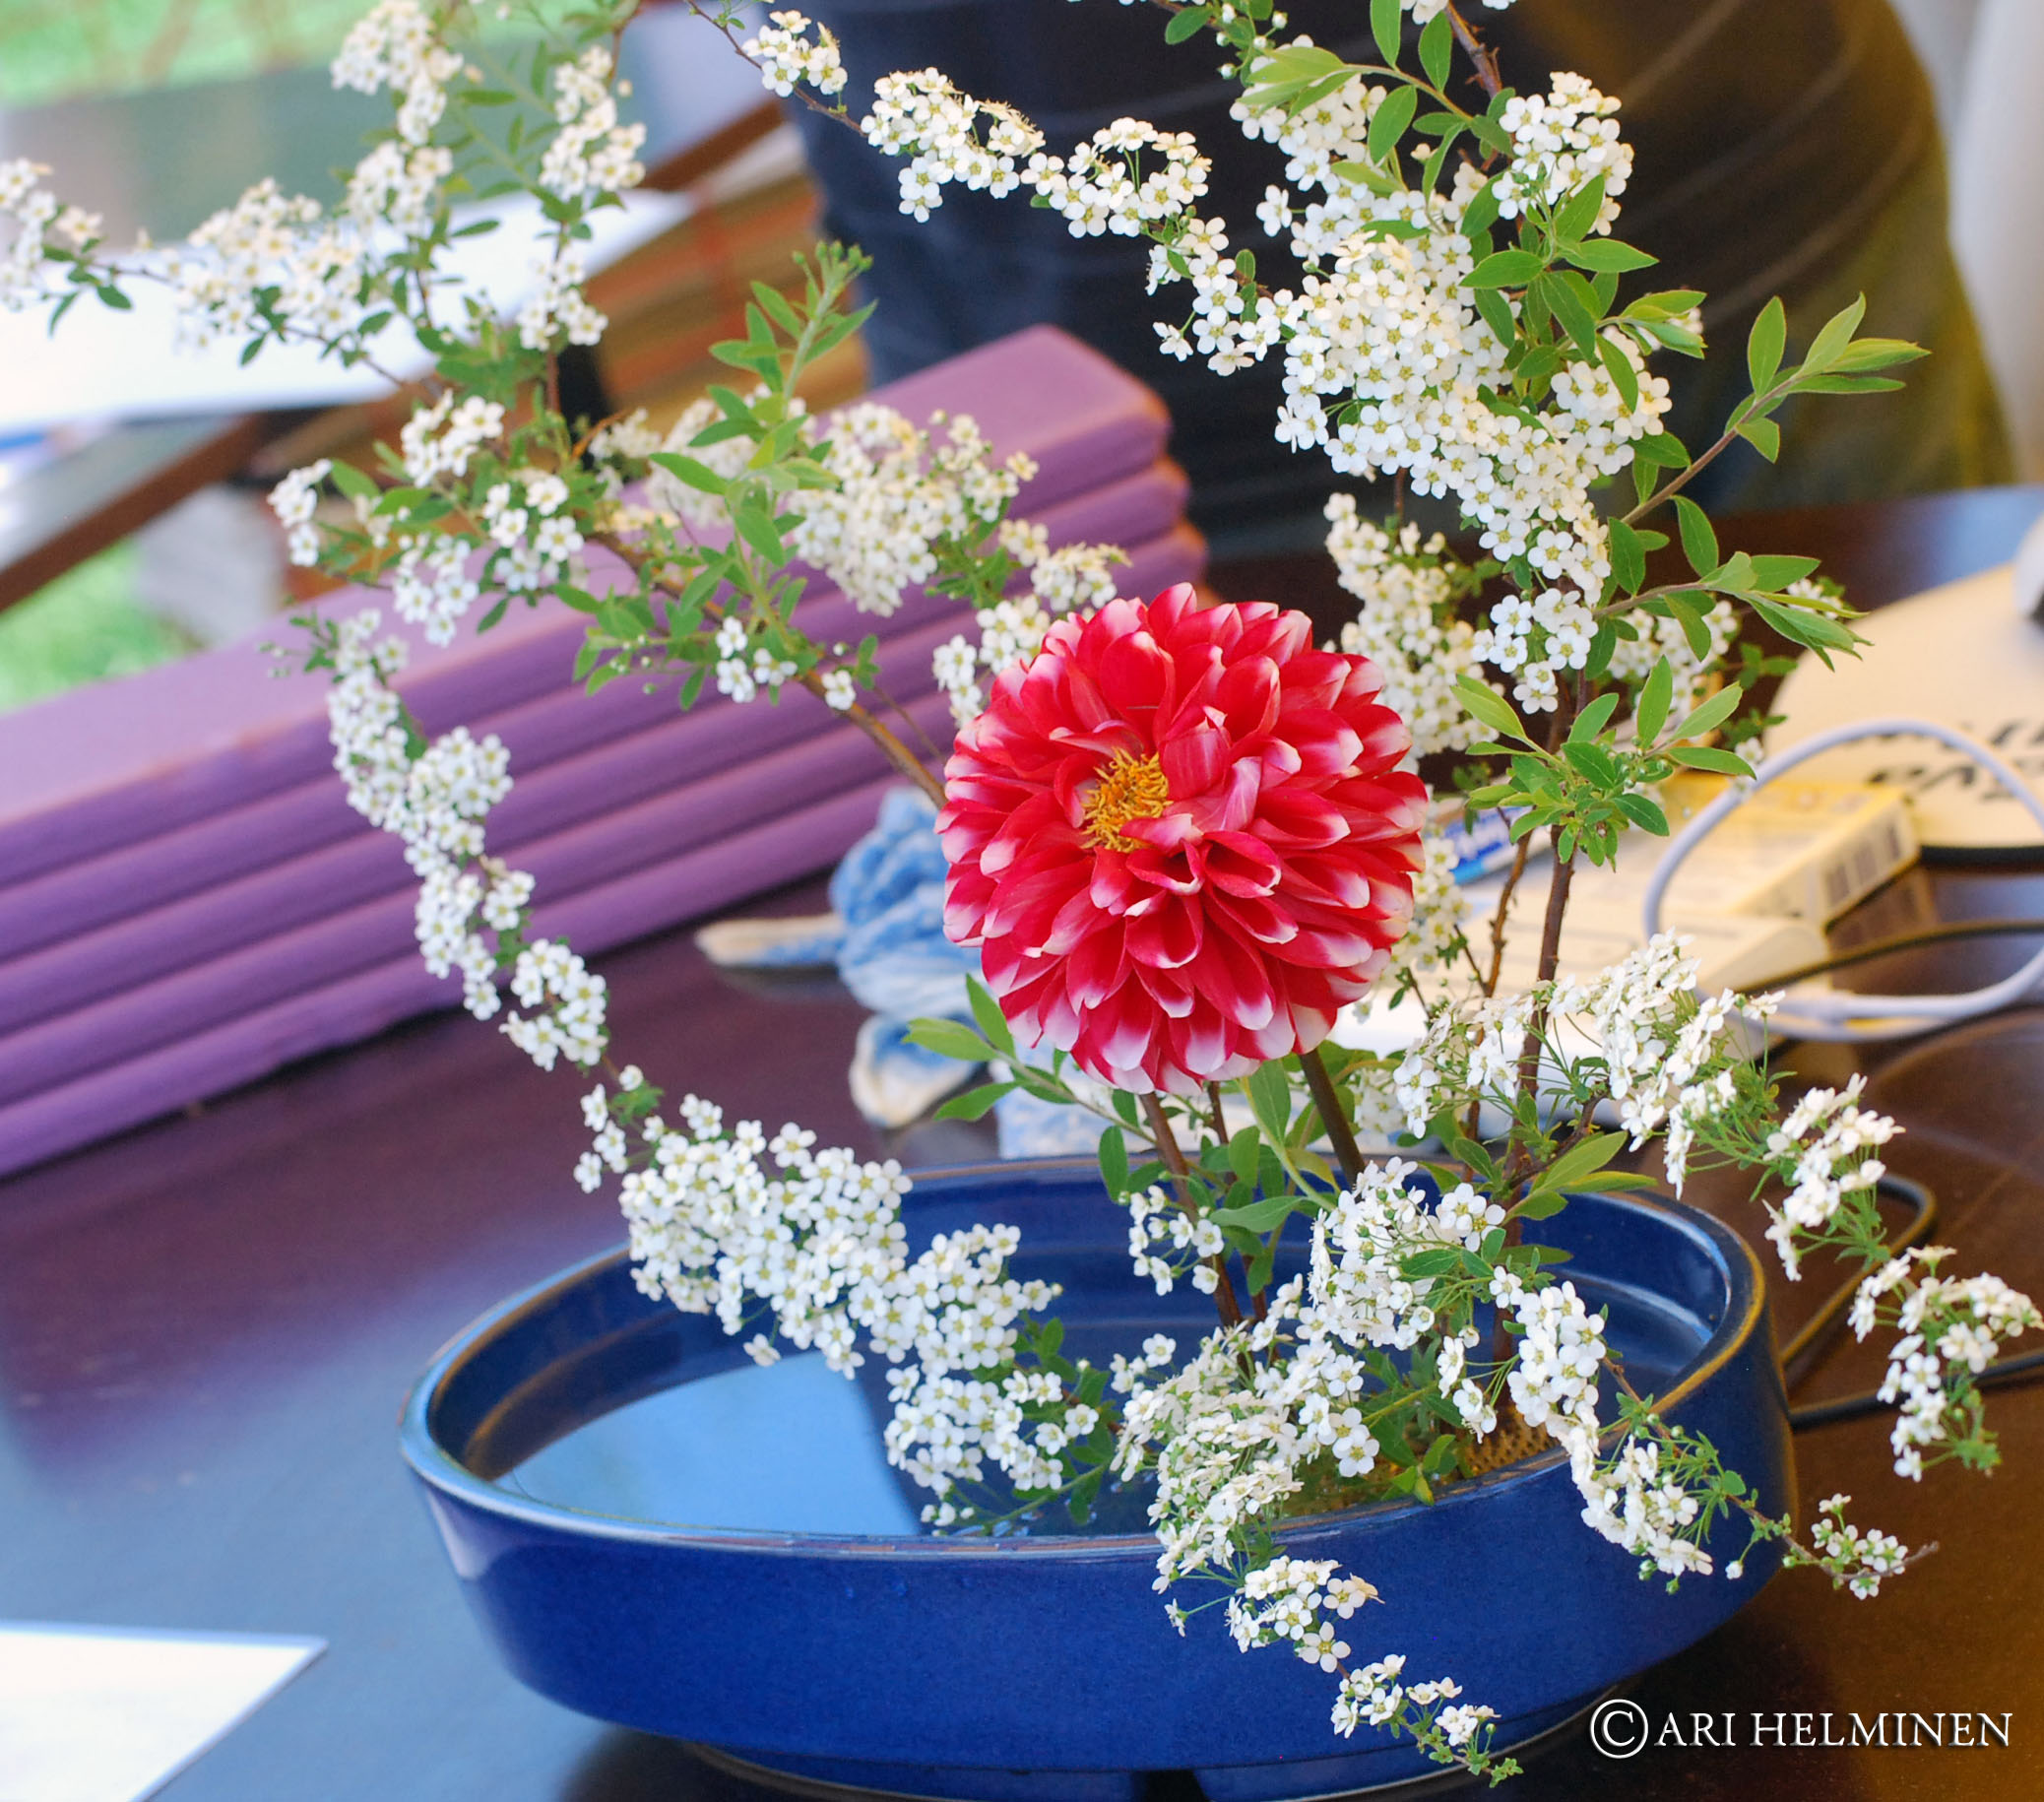 Ikebana 生け花 Japanese art of flower arrangement